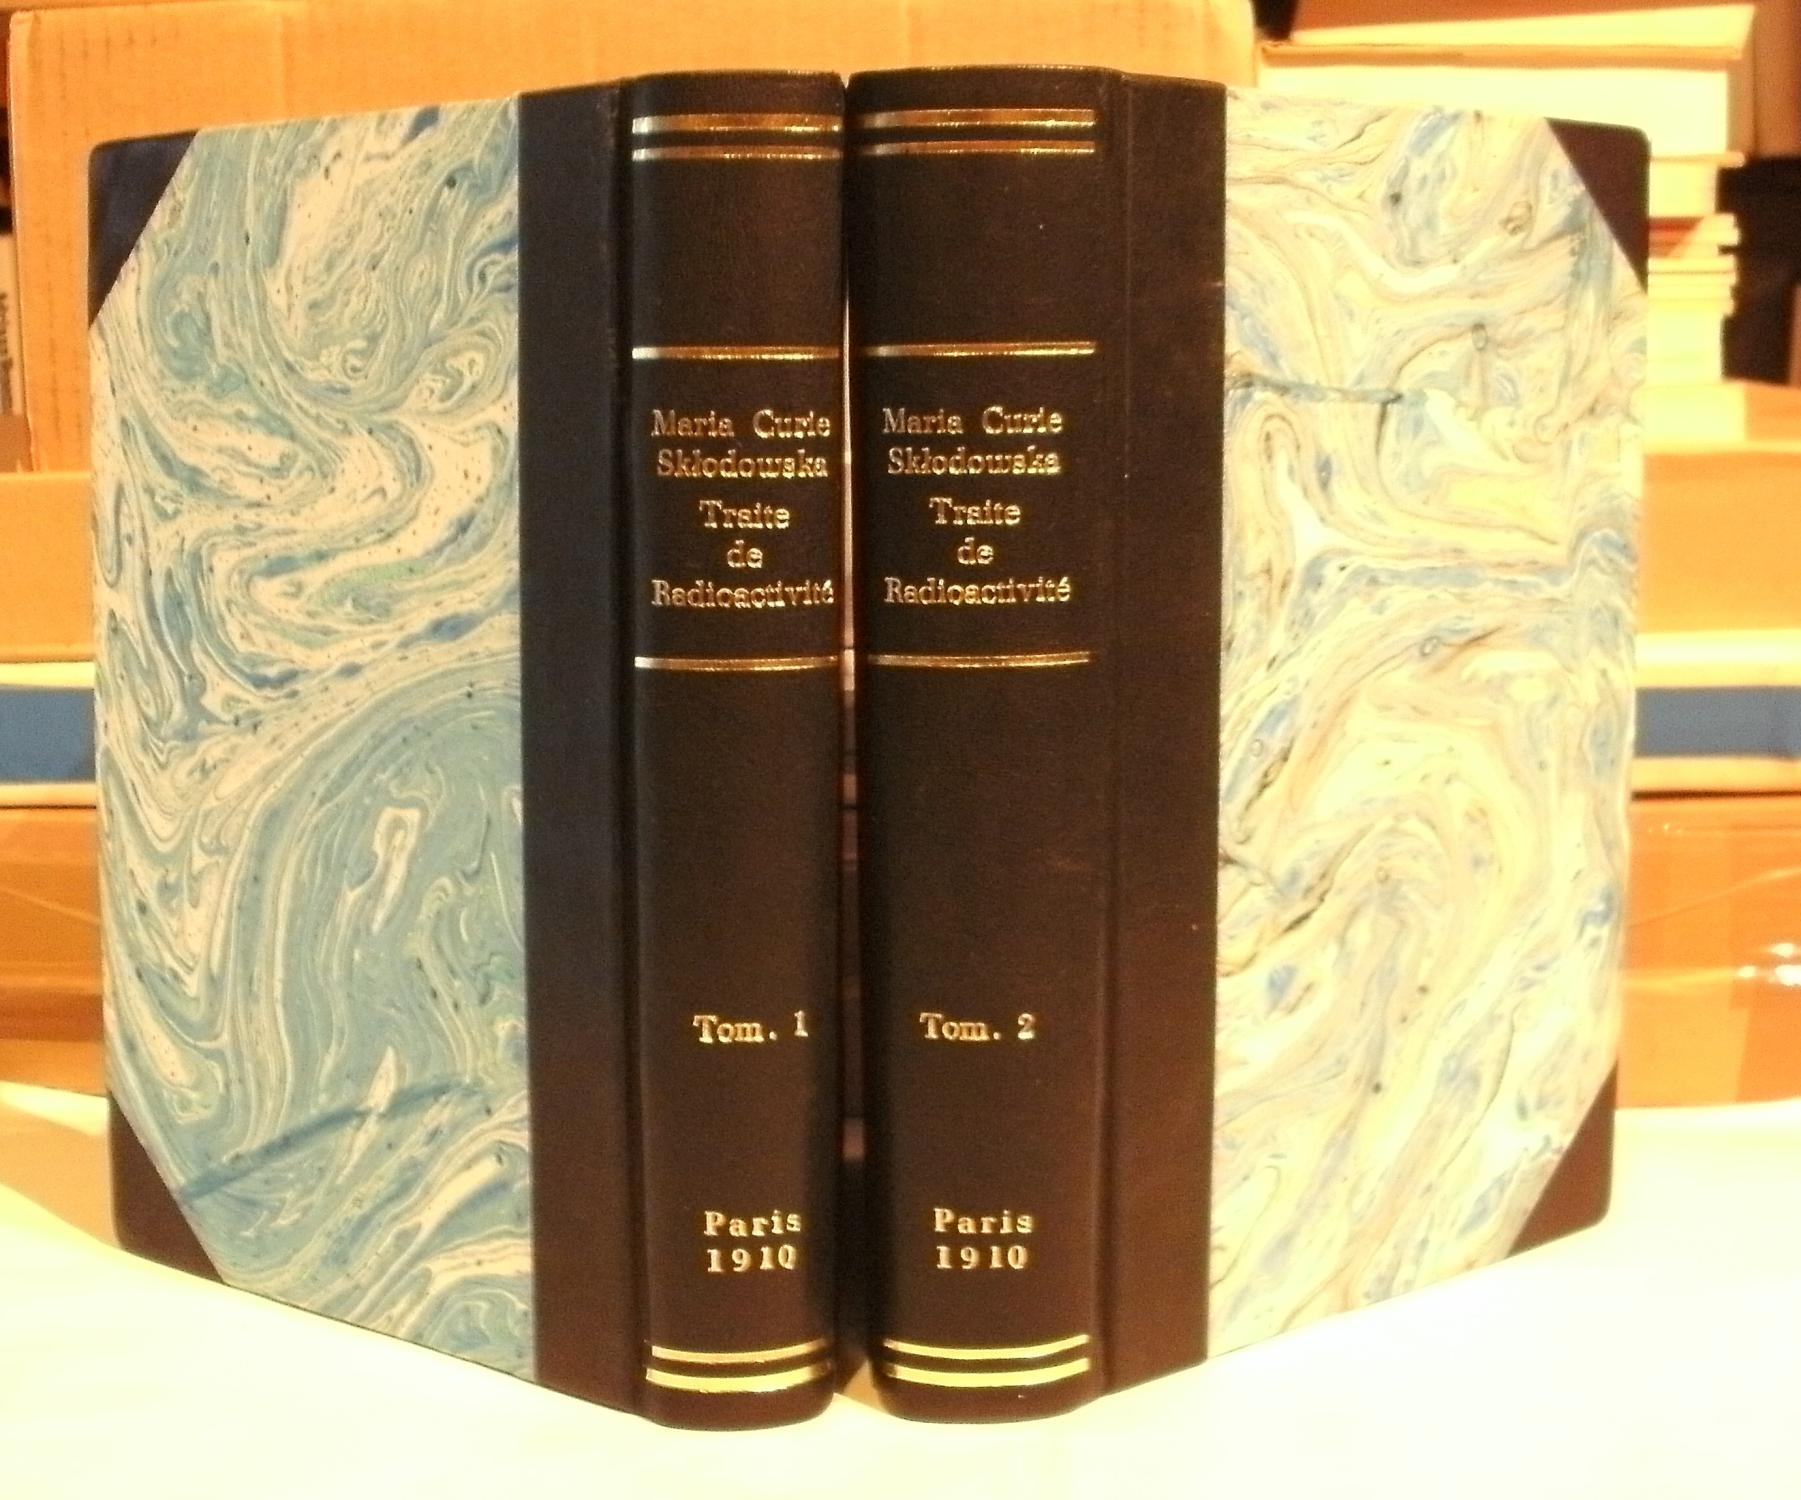 Traité de Radioactivité - Tome I, Tome II: CURIE, Madame P (Marie Curie Sklodowska)